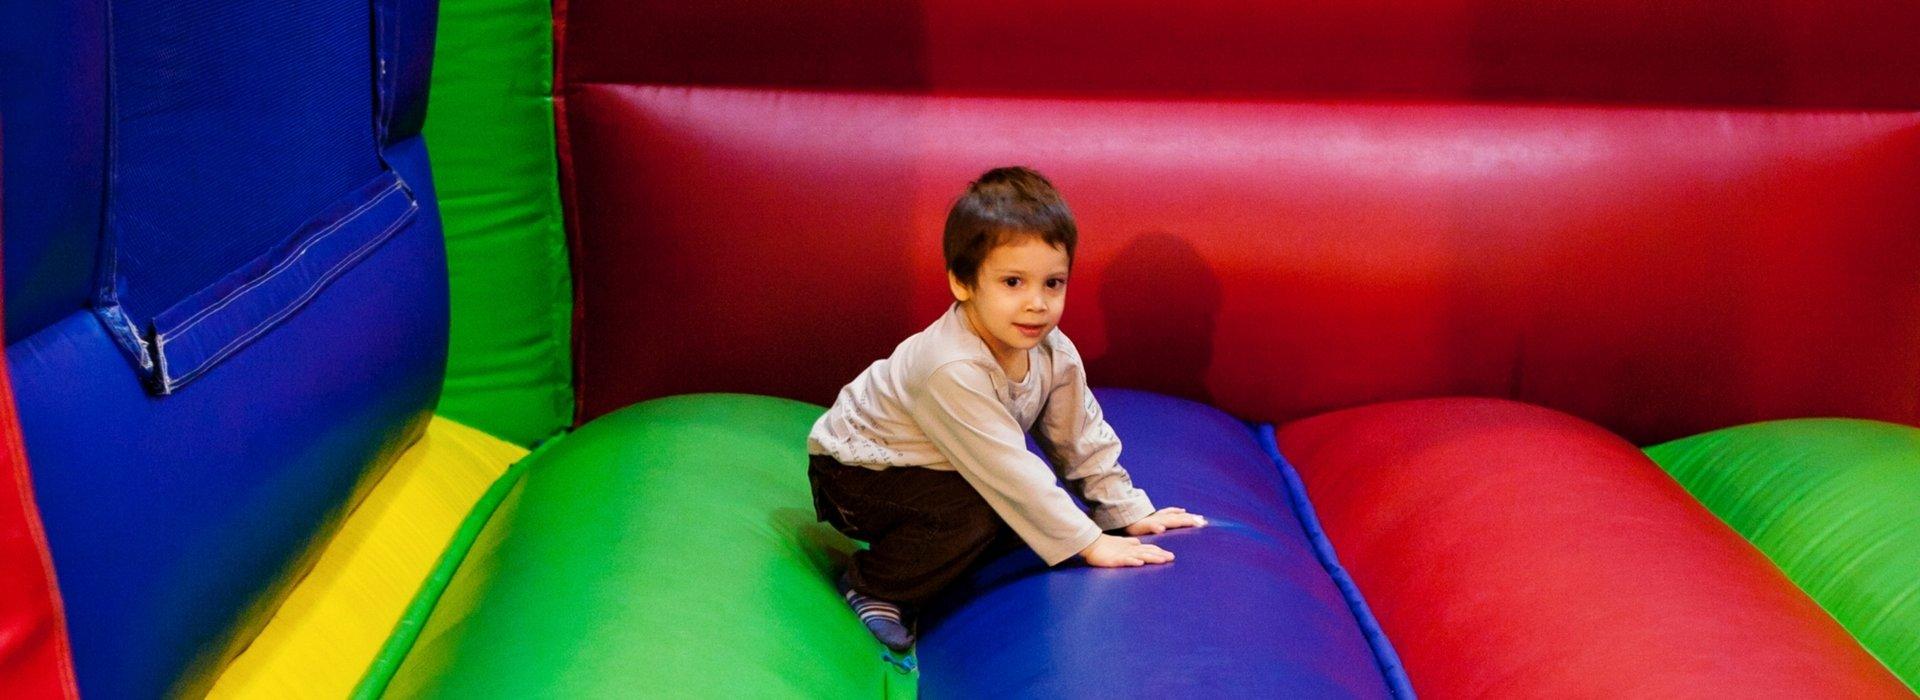 Familien- und Kinderprogramme